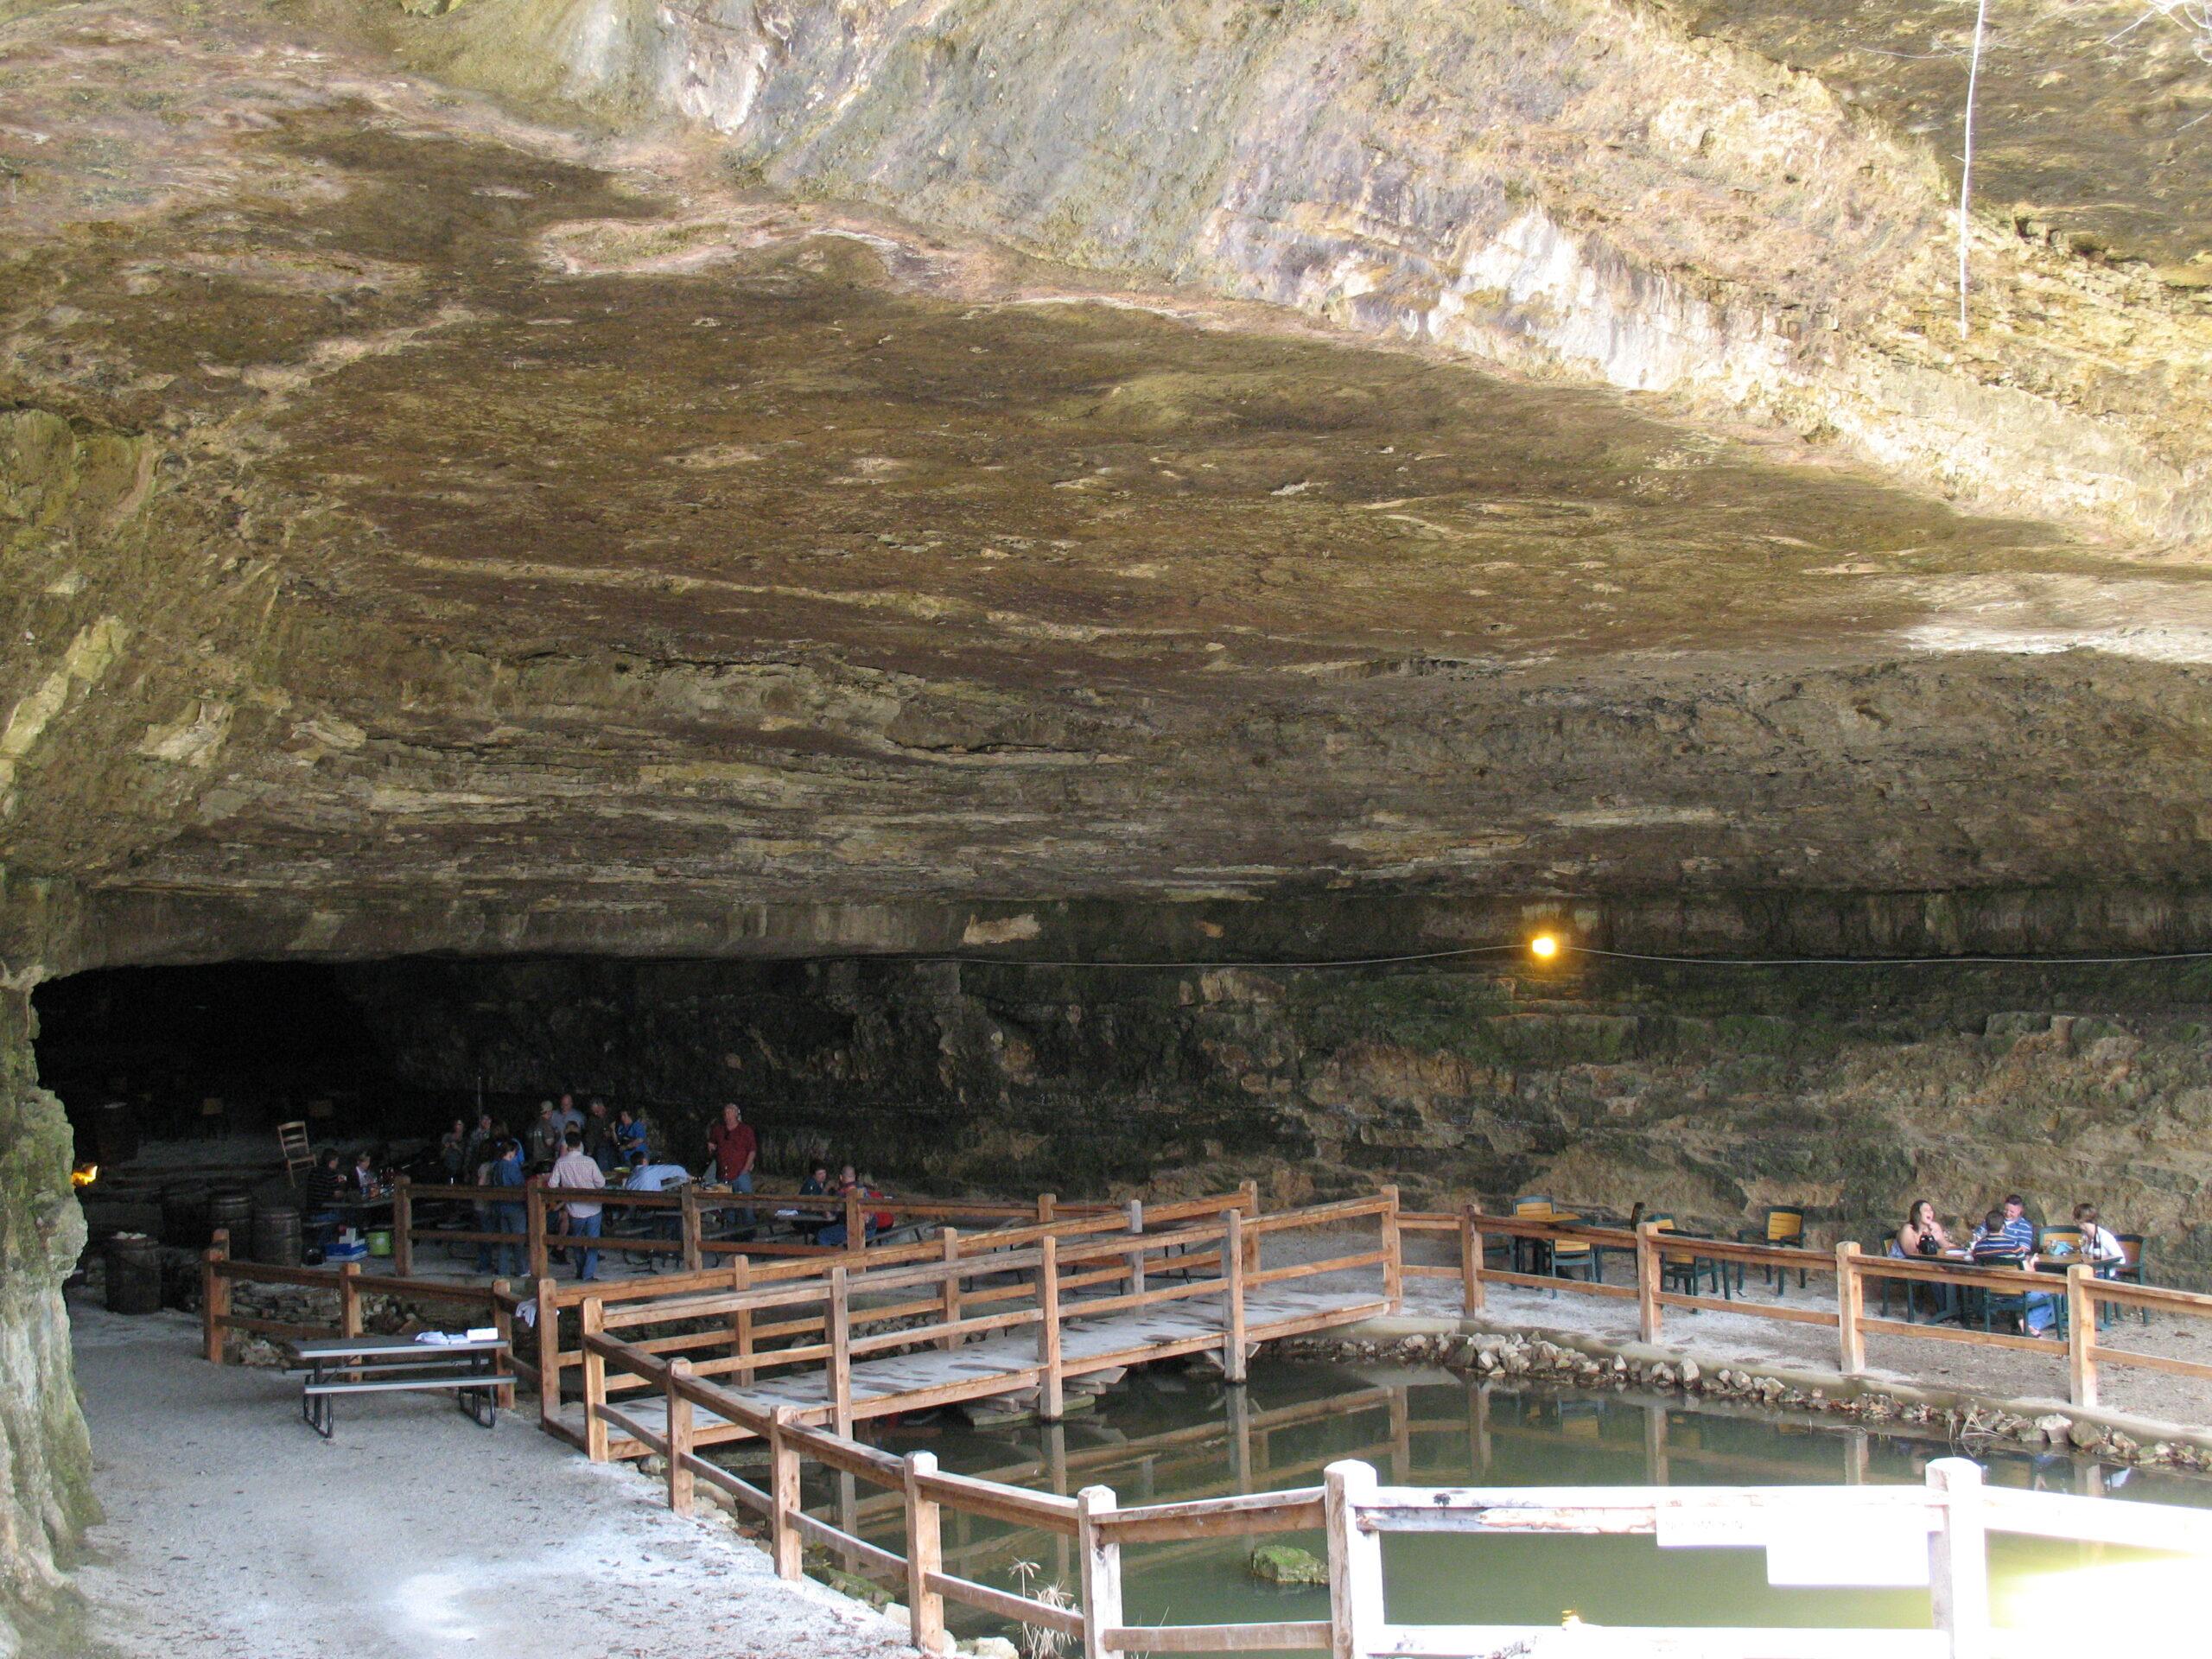 Cave Vineyard & Distillery (Ste. Genevieve, MO)